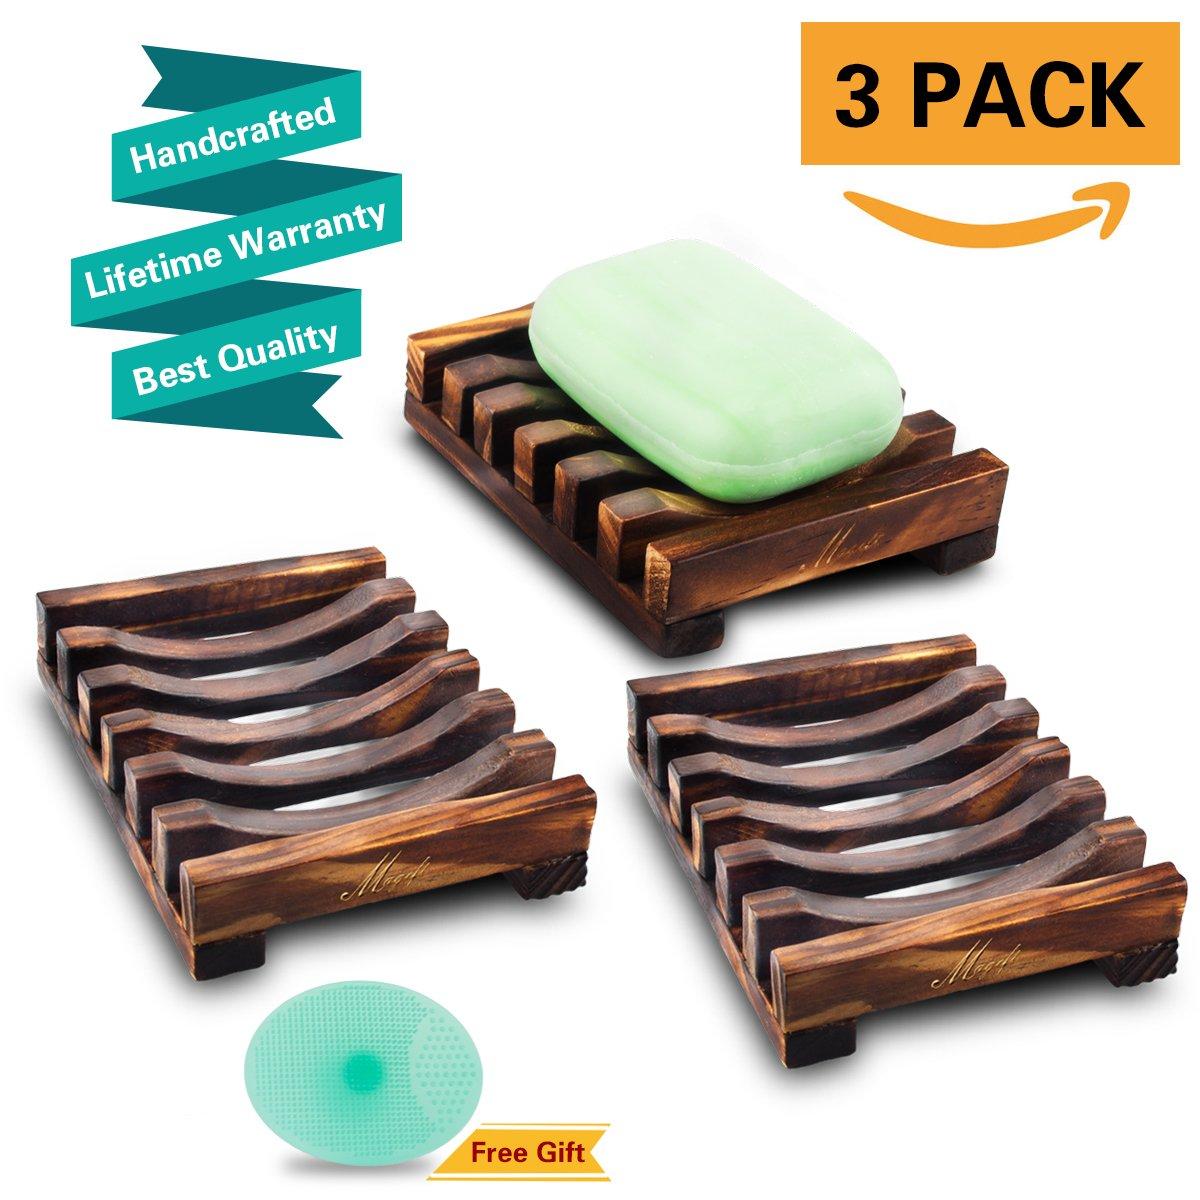 Magift 3 Piece Soap Dish Holder, Bathroom Wooden Soap Case, Sink Deck Bathtub Shower Dish, Rectangular, Hand Craft, Natural Wooden Holder for Soap, Sponges, Scrubber